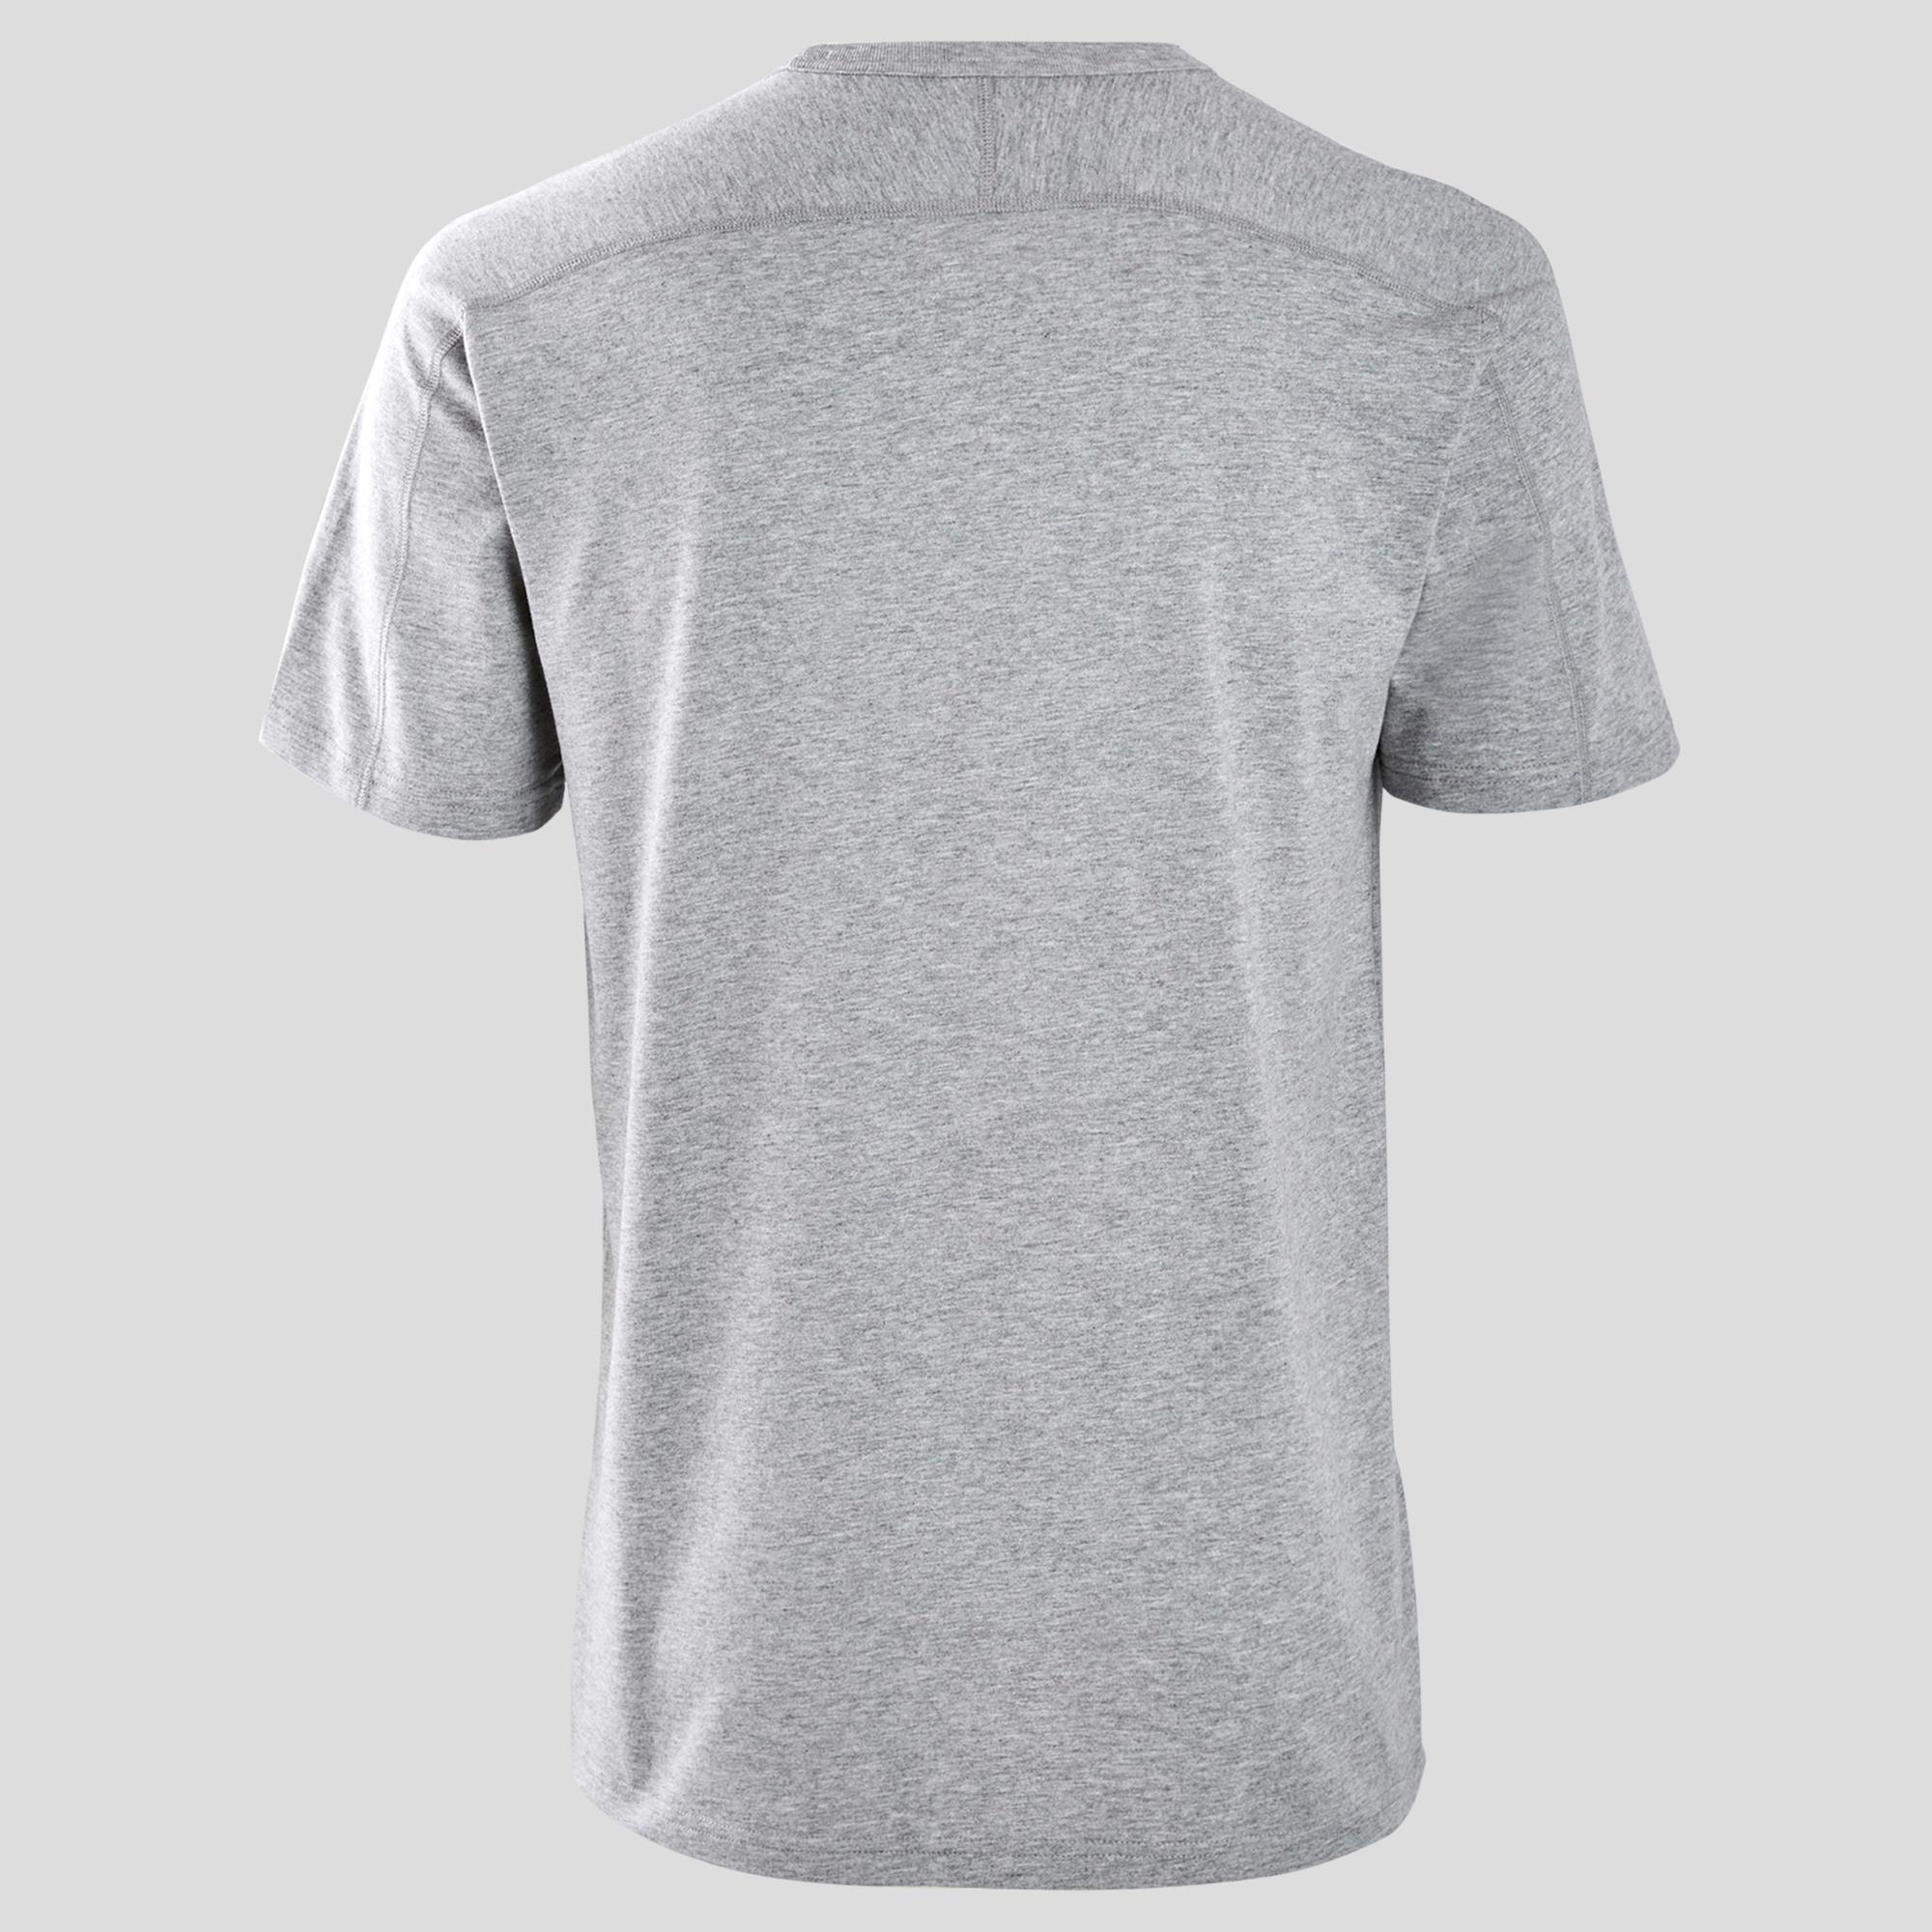 b540896c6 Regular Adidas Hombre Camiseta Gris Gimnasia Pilates Y Suave nk0wPNX8OZ